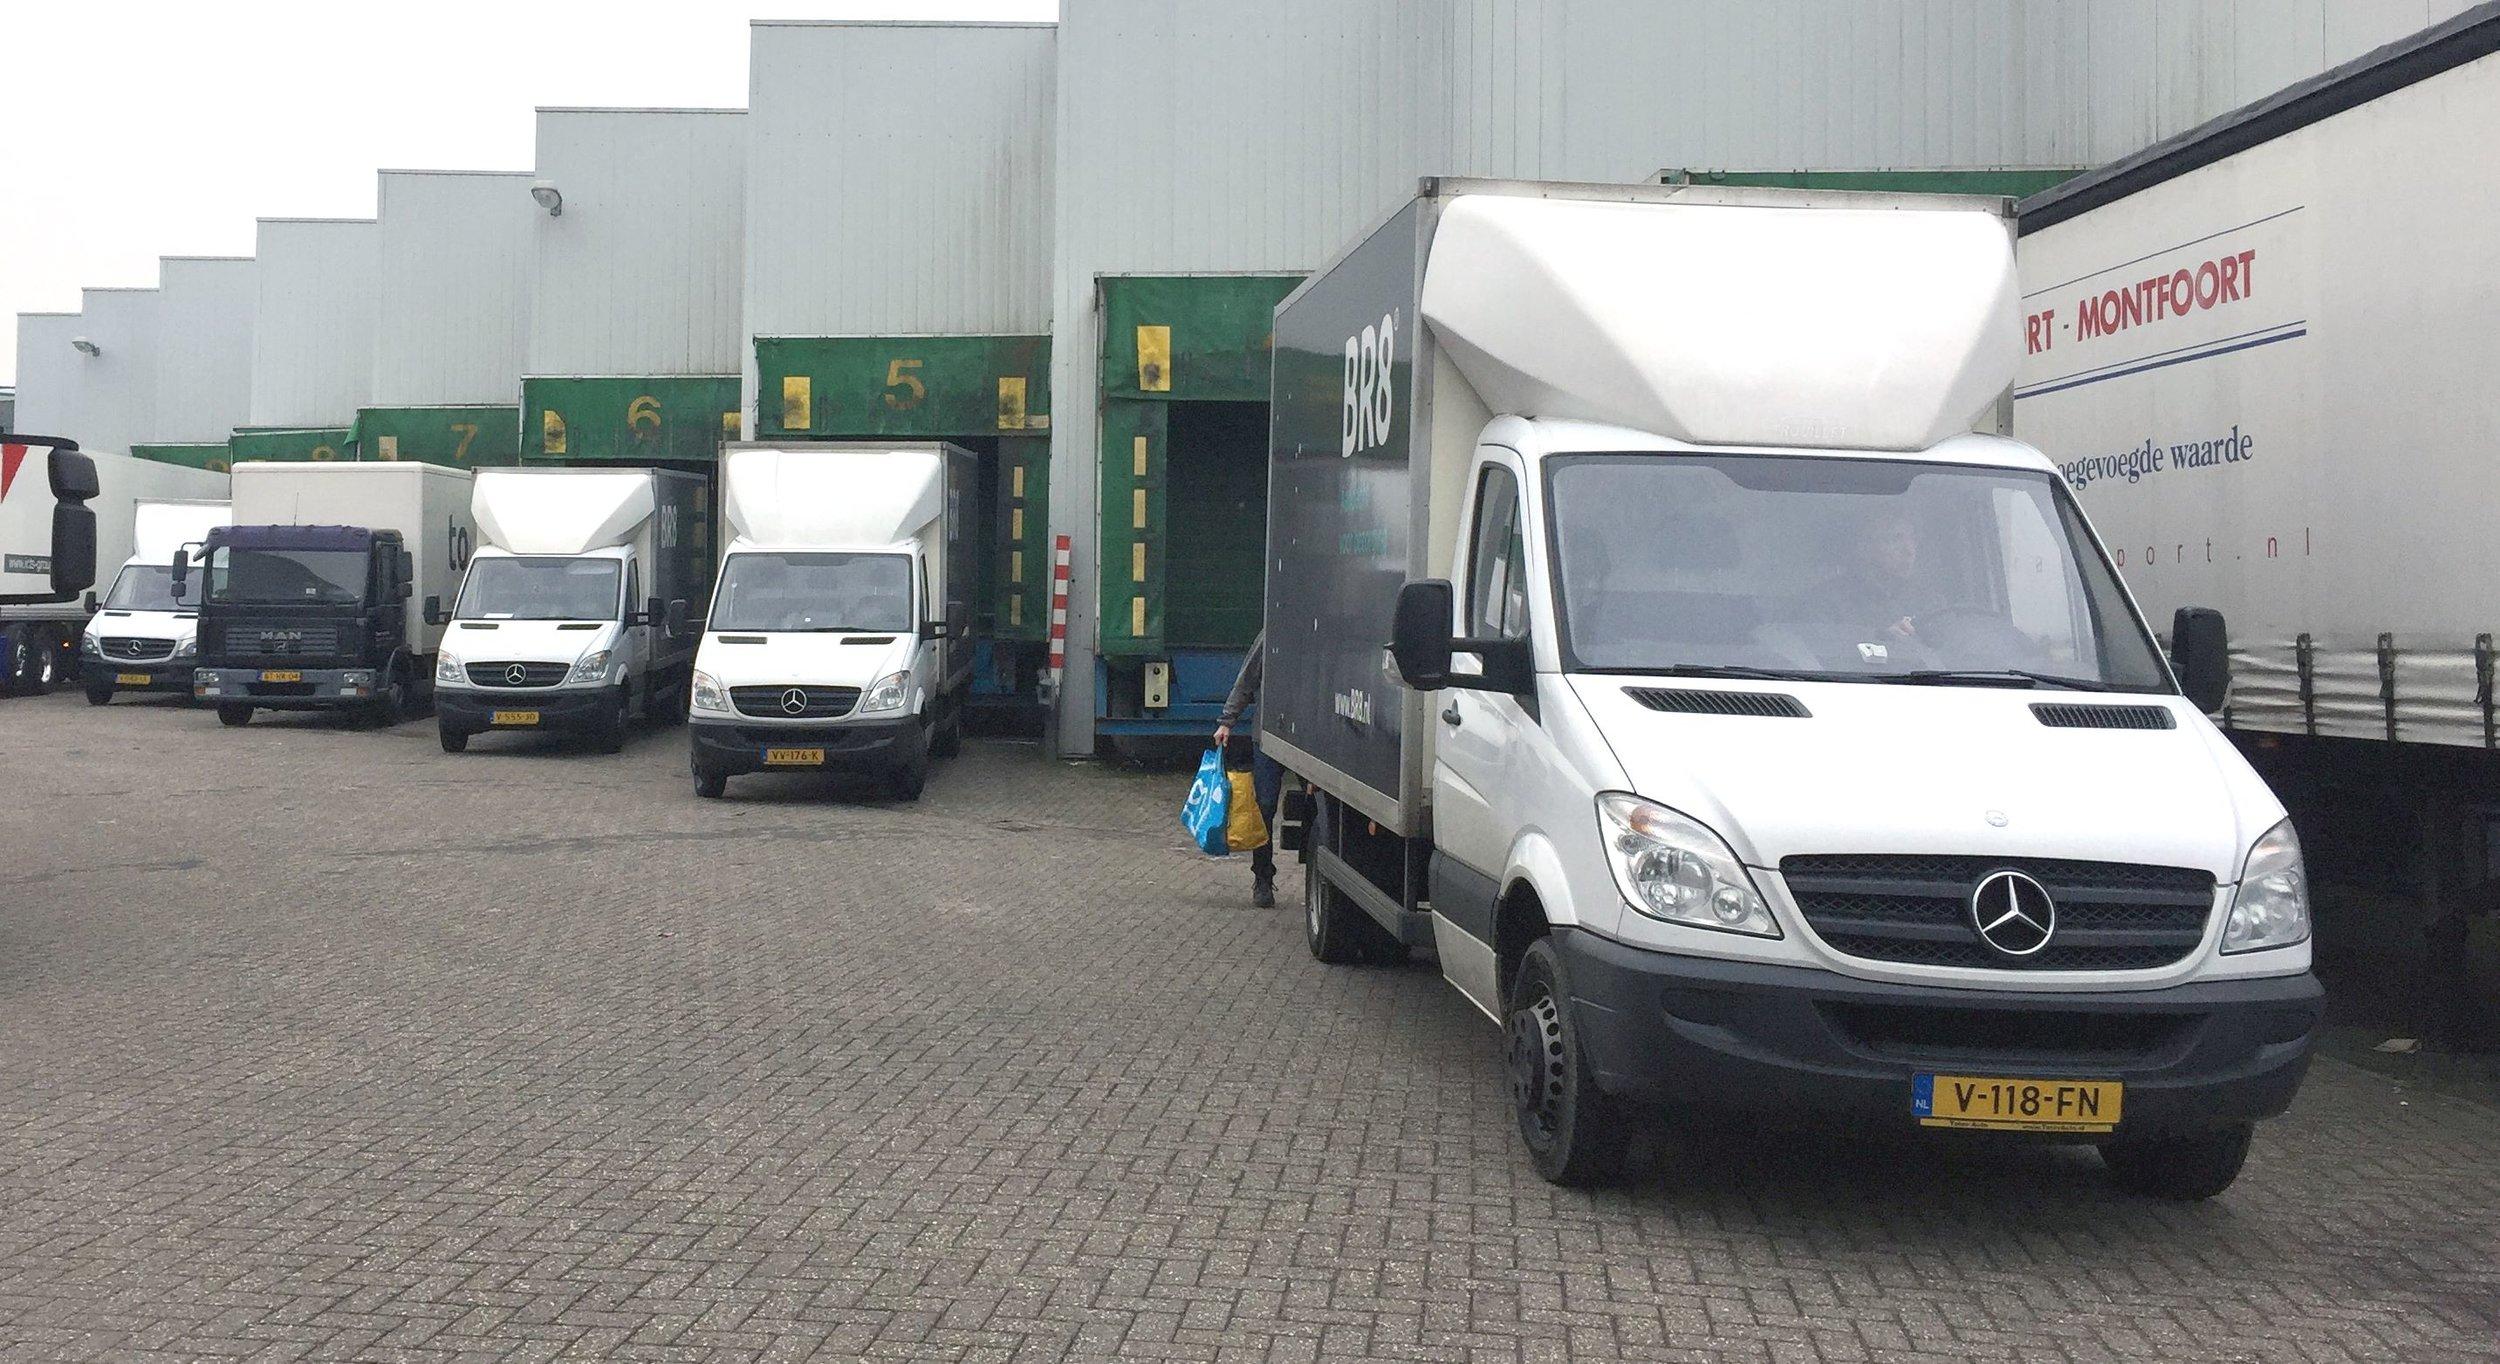 The current fleet: 4 * 19m3 vans, 1 * 40m3 truck